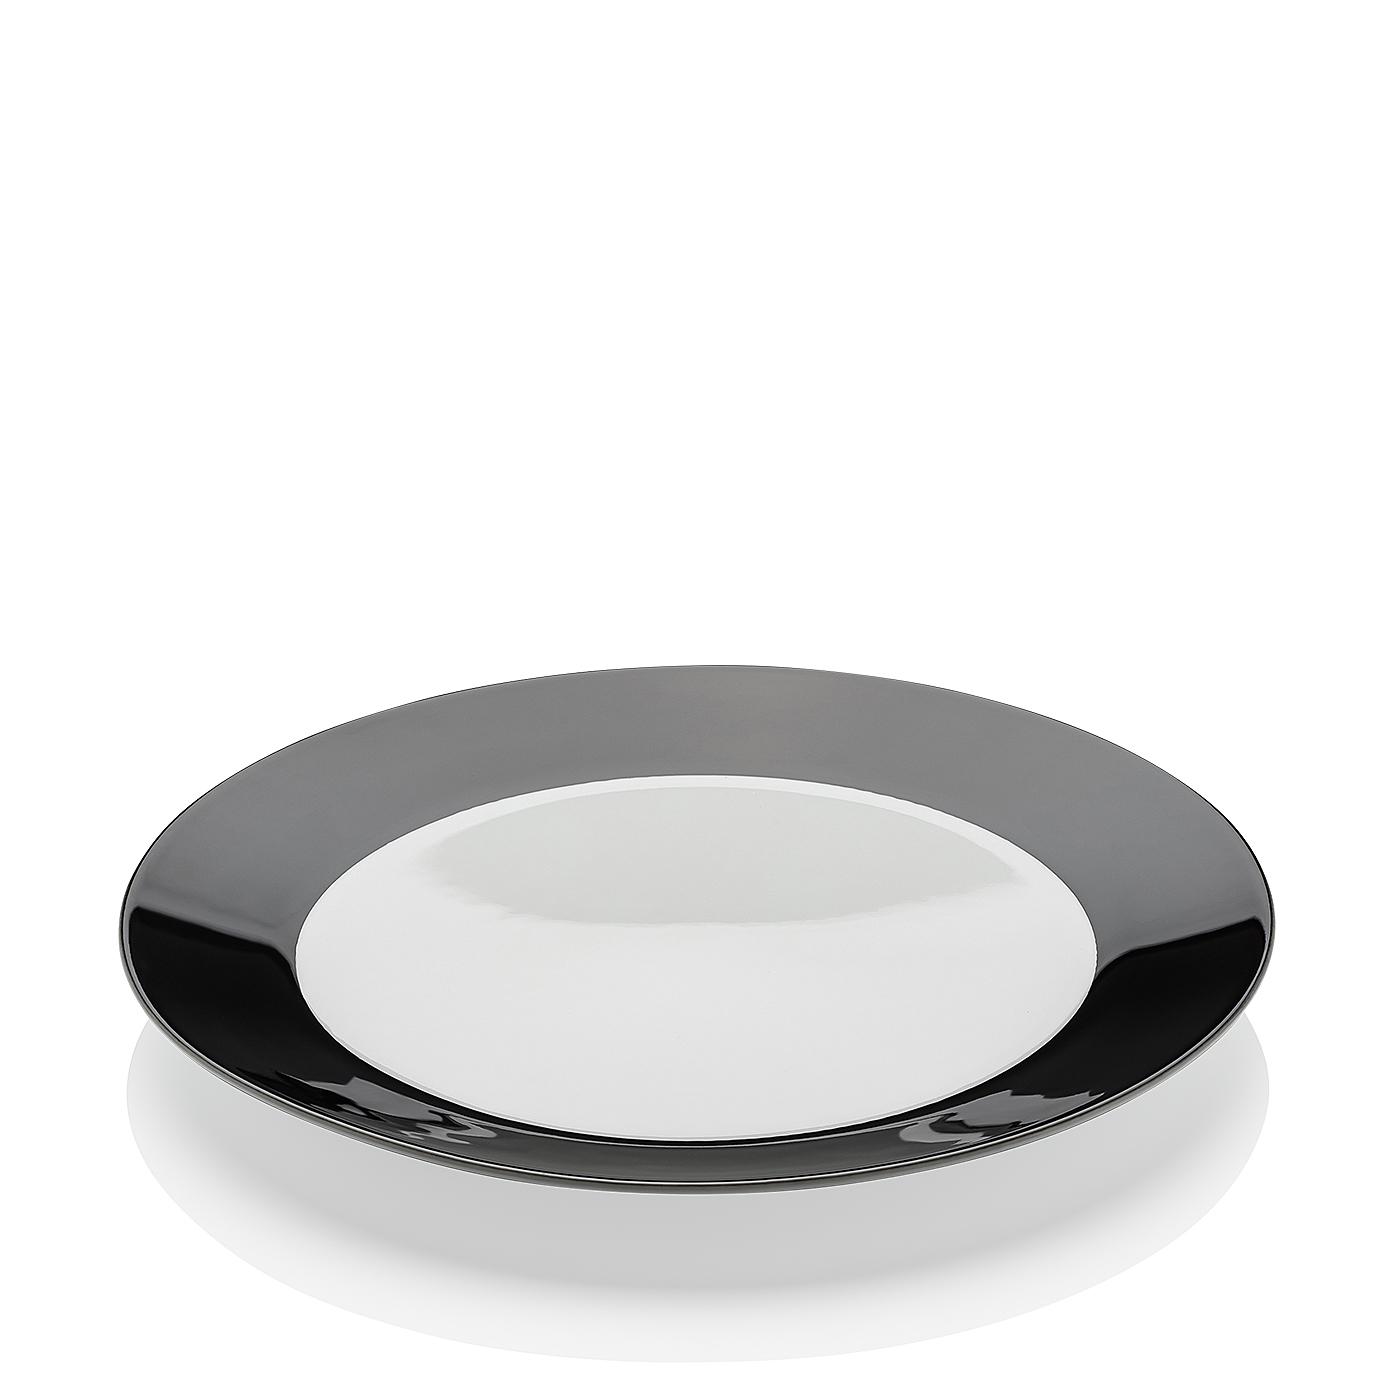 Gourmetteller 32 cm Tric Monochrome Arzberg